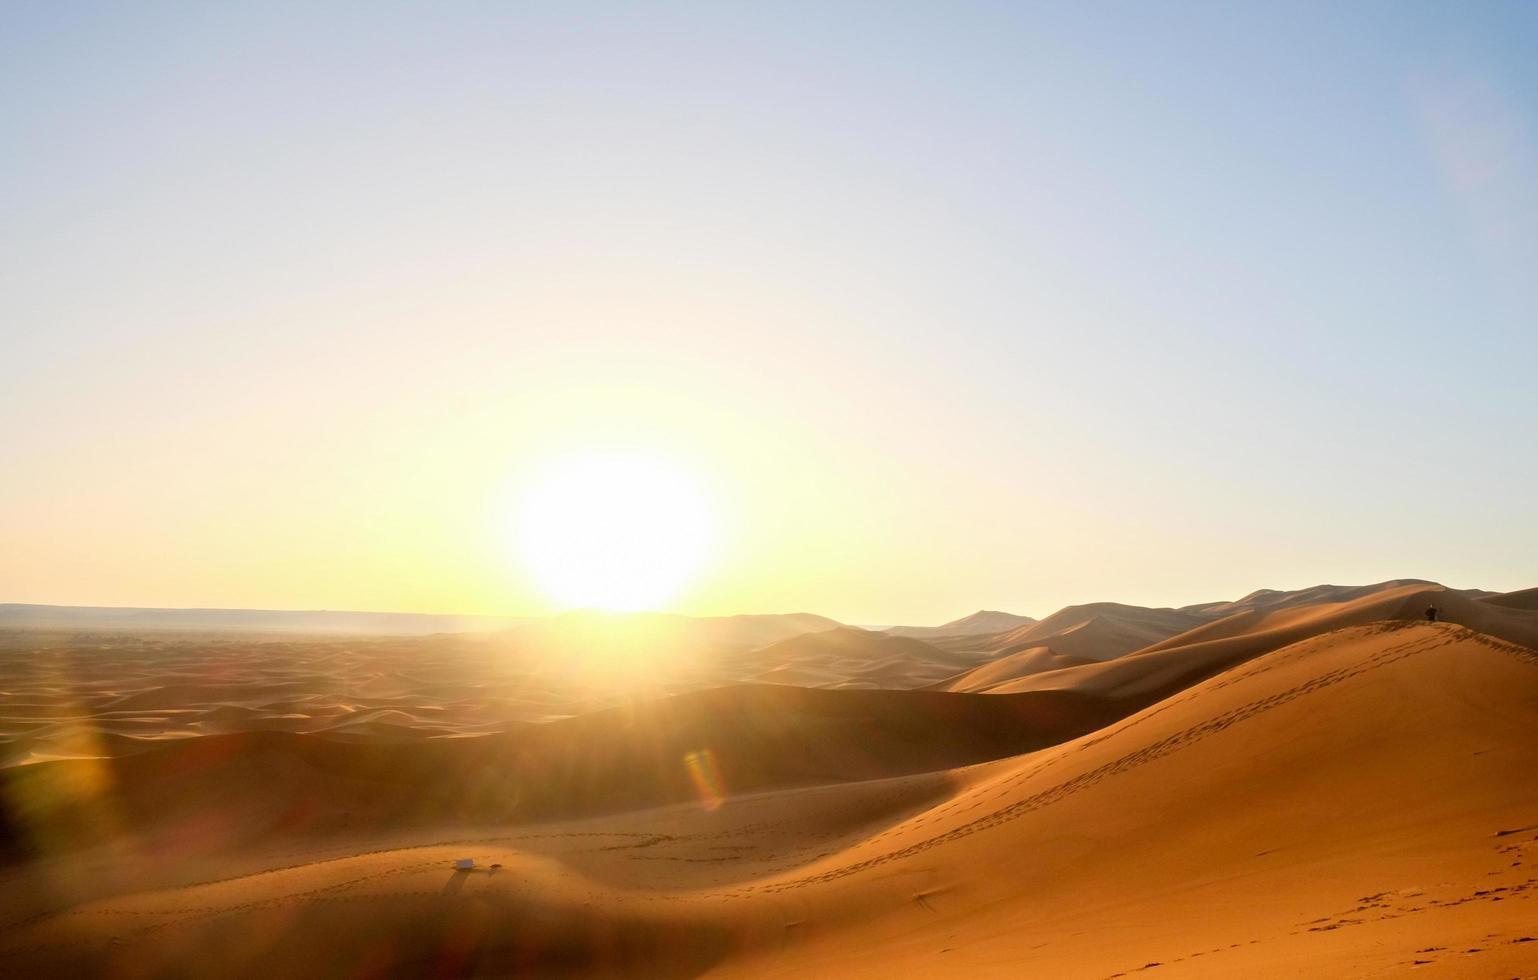 Sunrise over sand dunes at Erg Chebbi photo